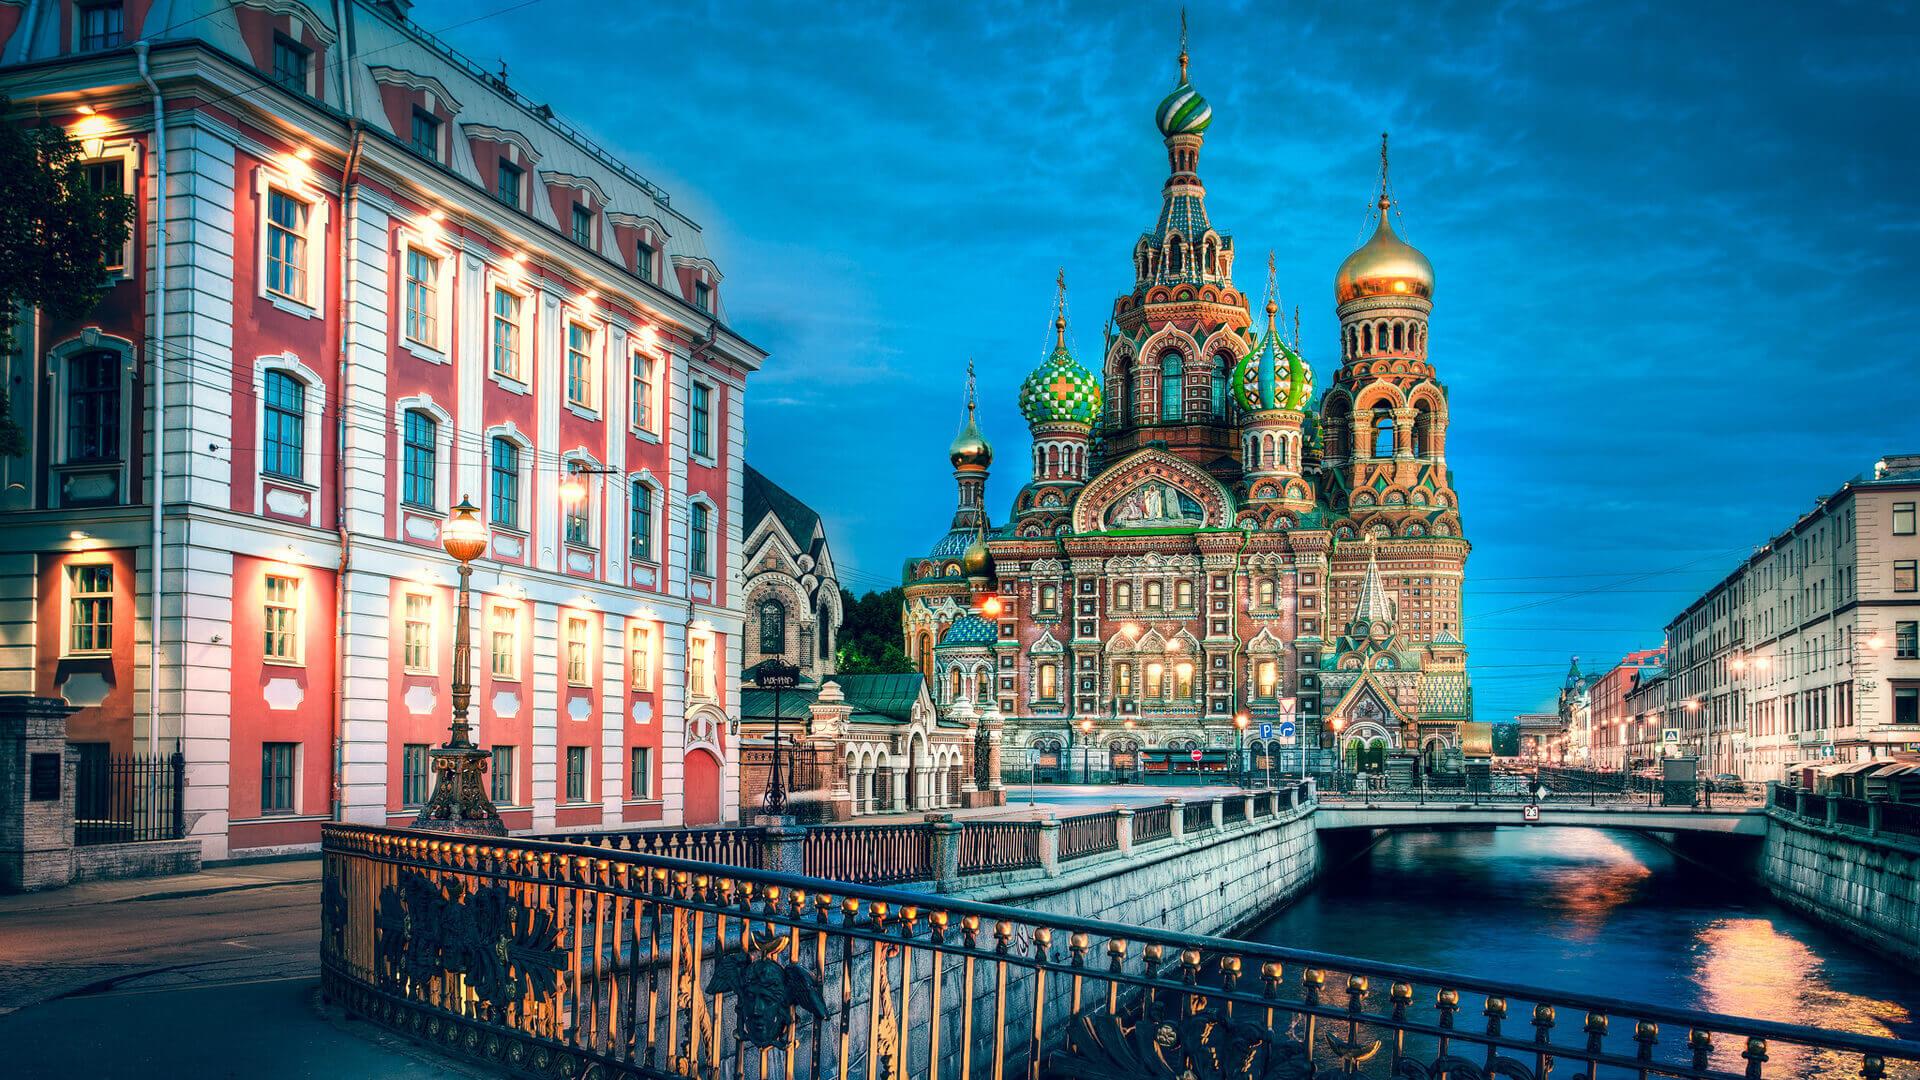 Private Jet Flights St. Petersburg